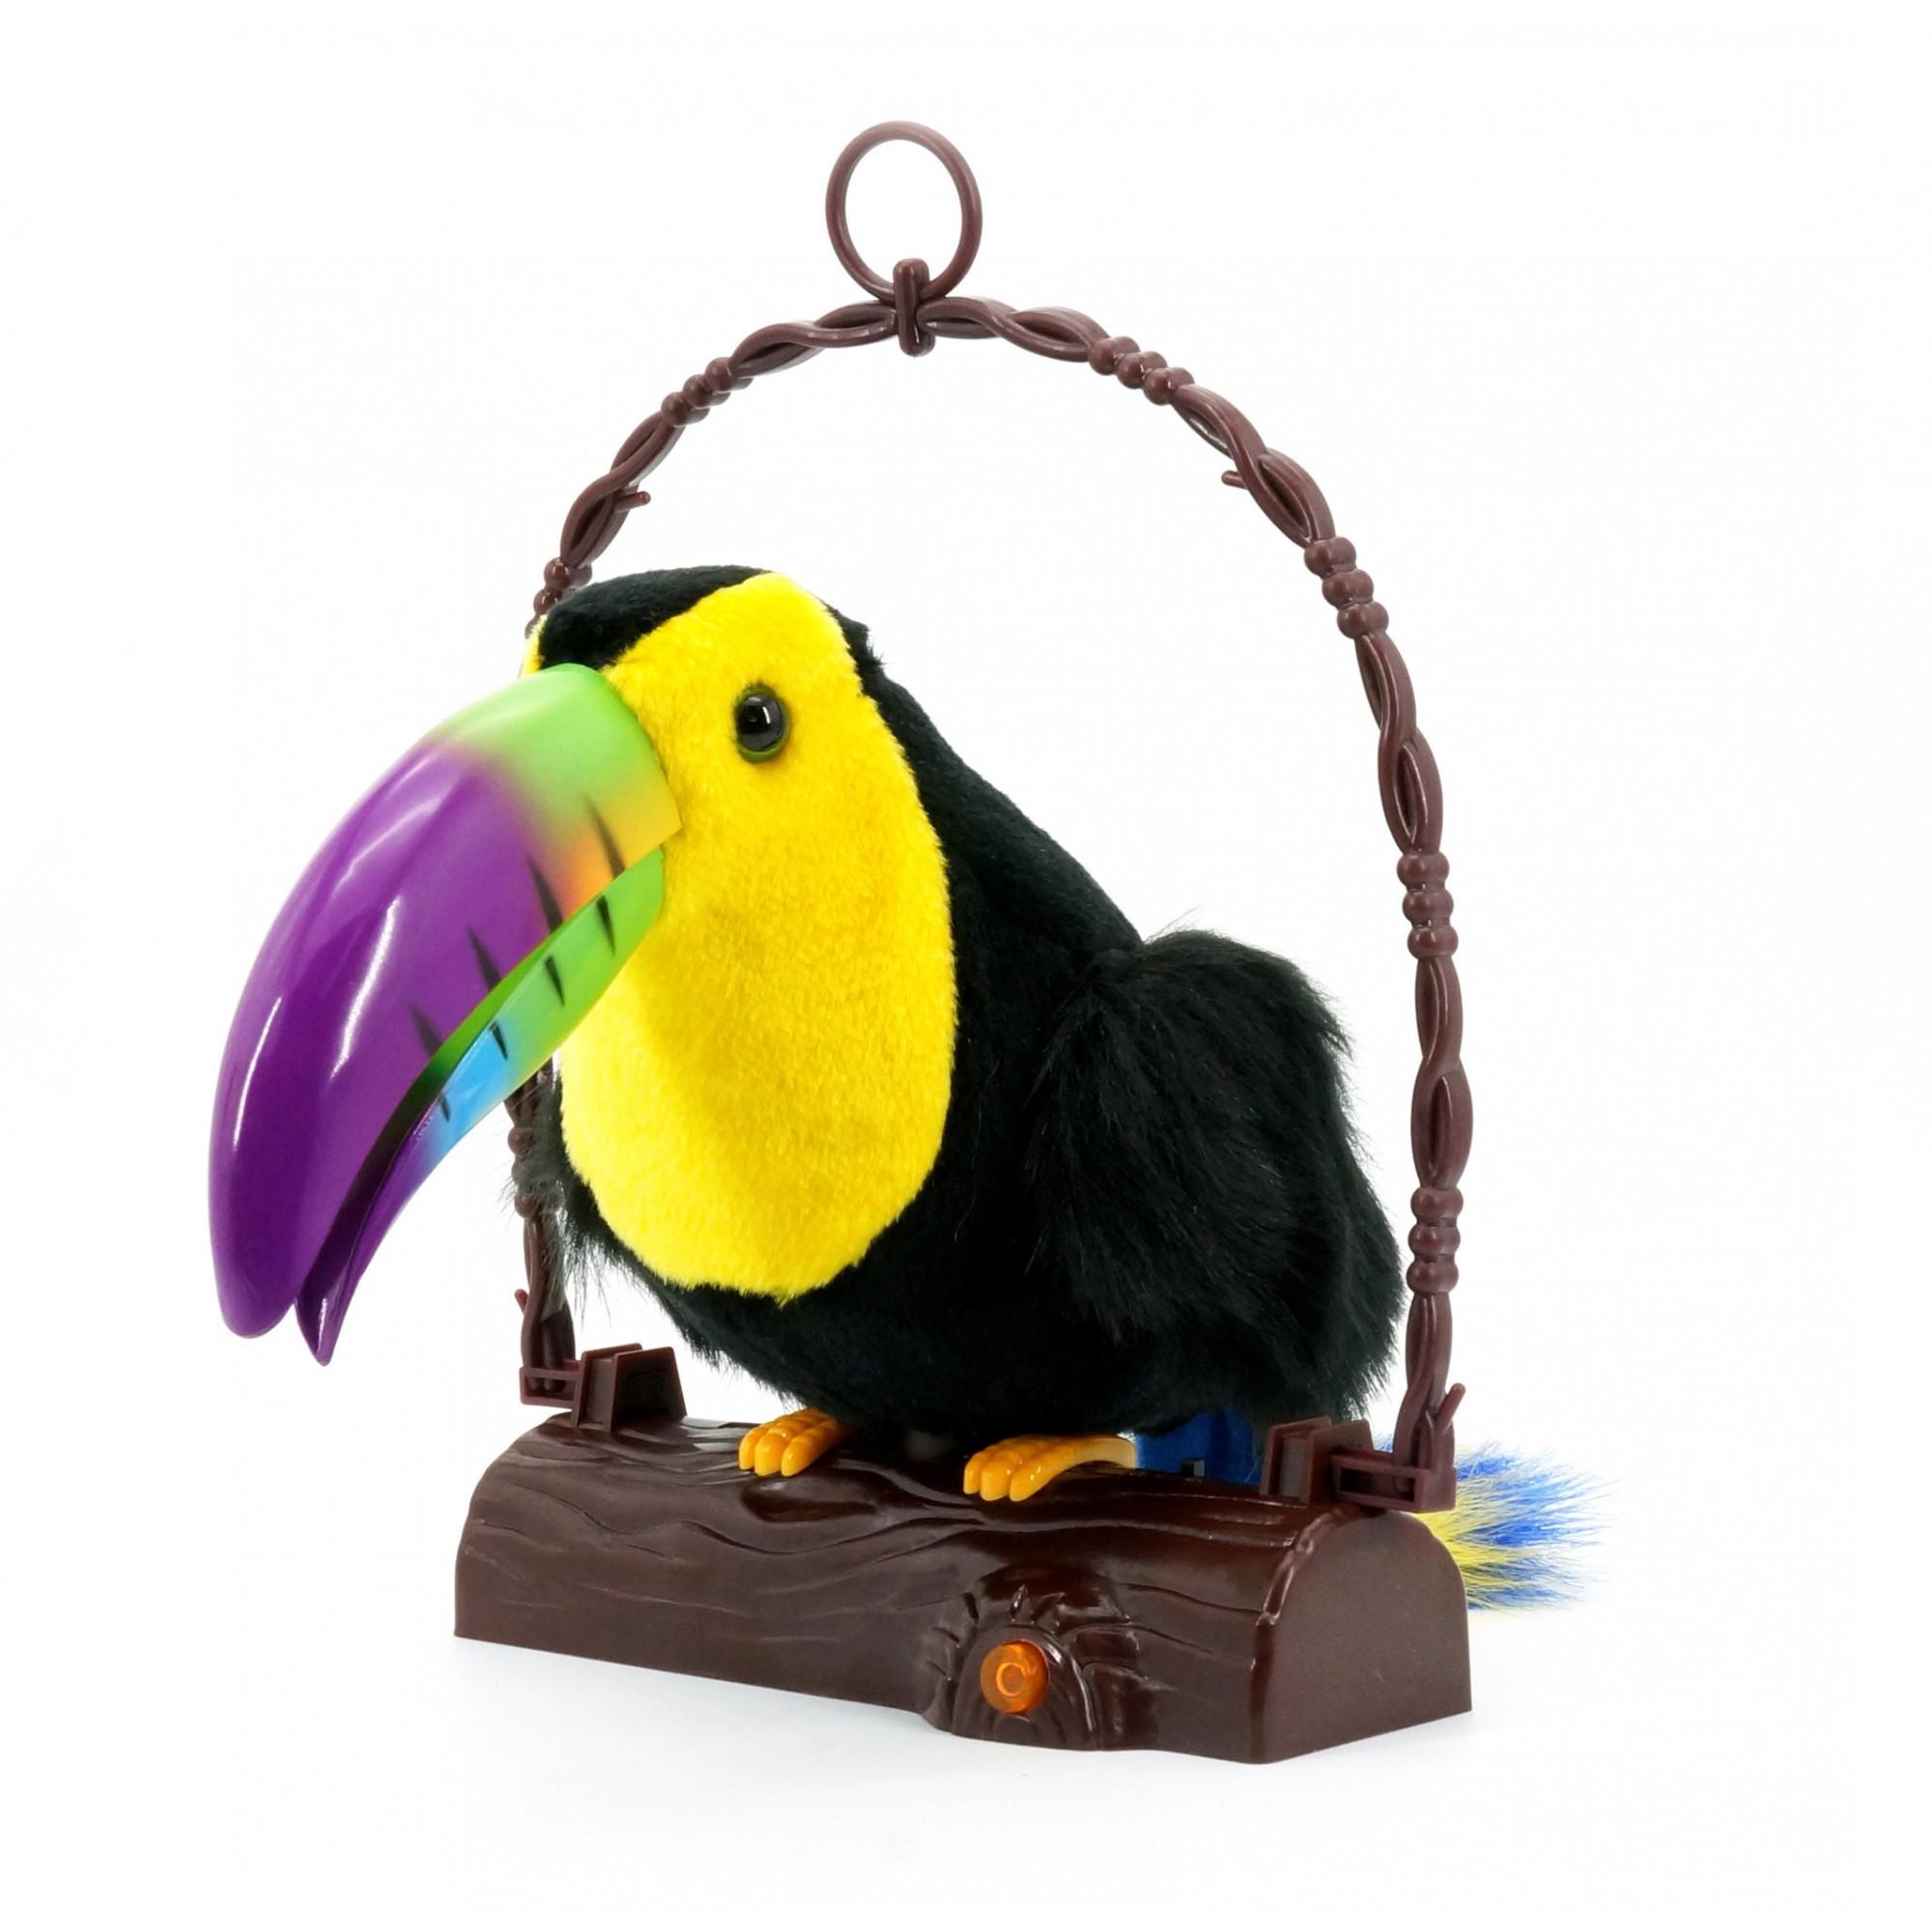 Electronic B/O Talking Toucan